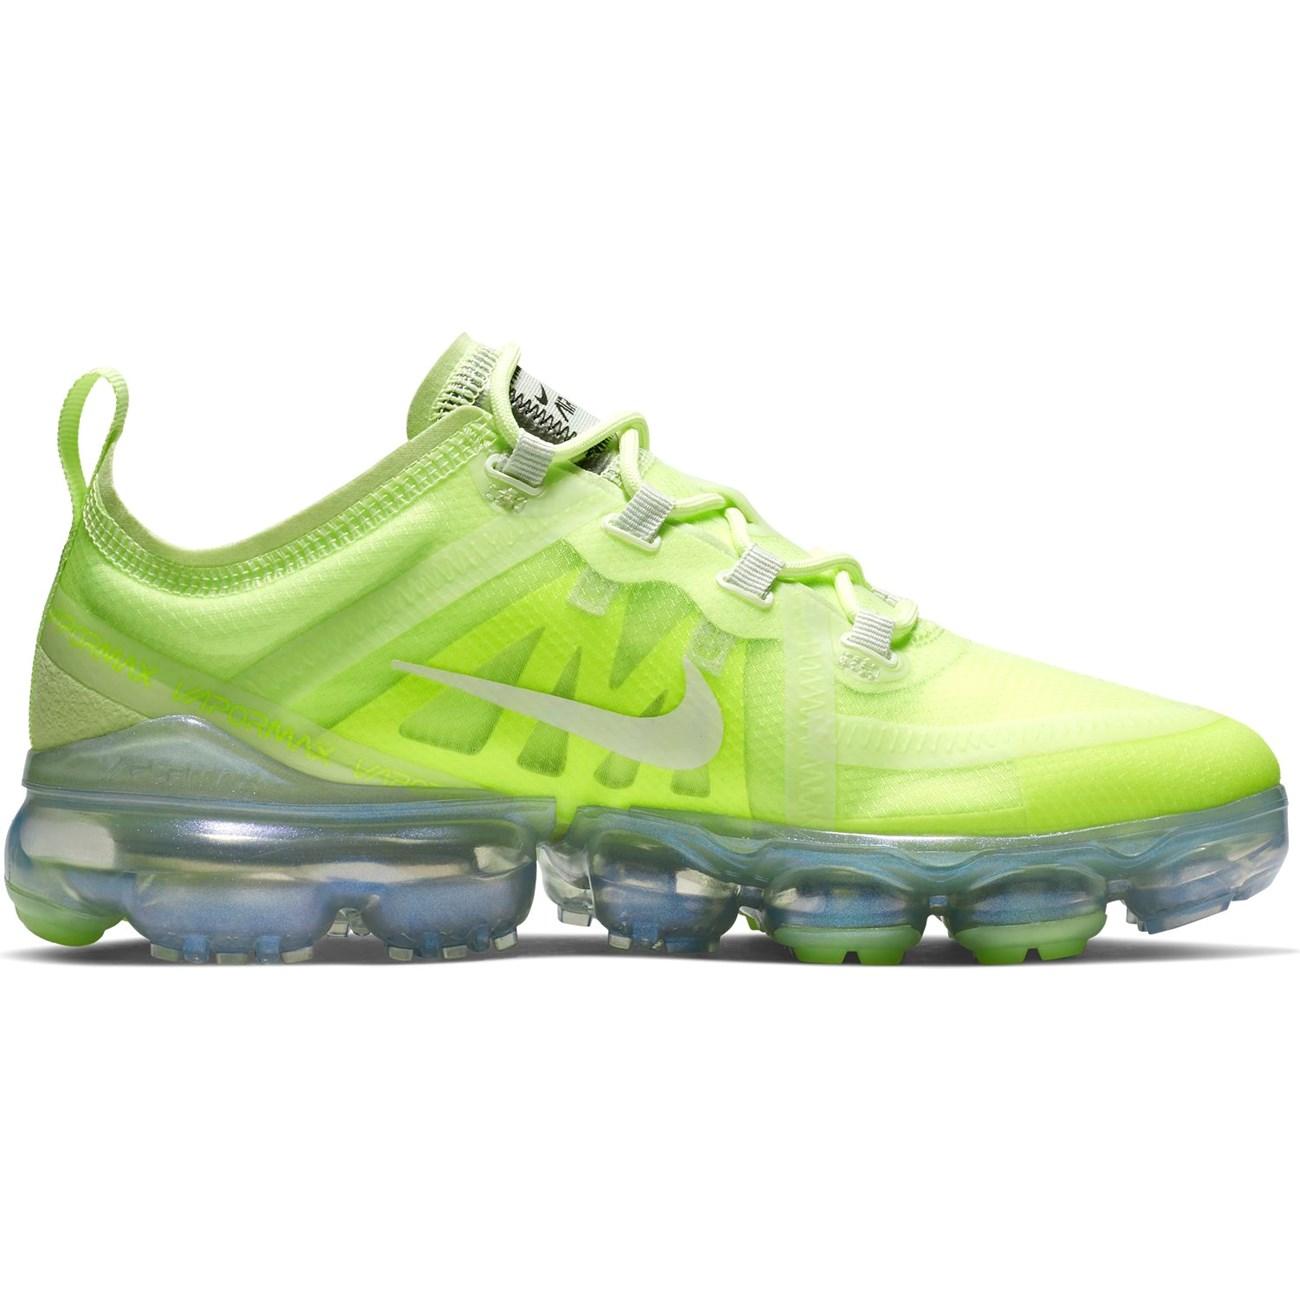 NIKE AIR VAPORMAX 2019 W   Παπούτσια για Τρέξιμο  5f1270dcb6e